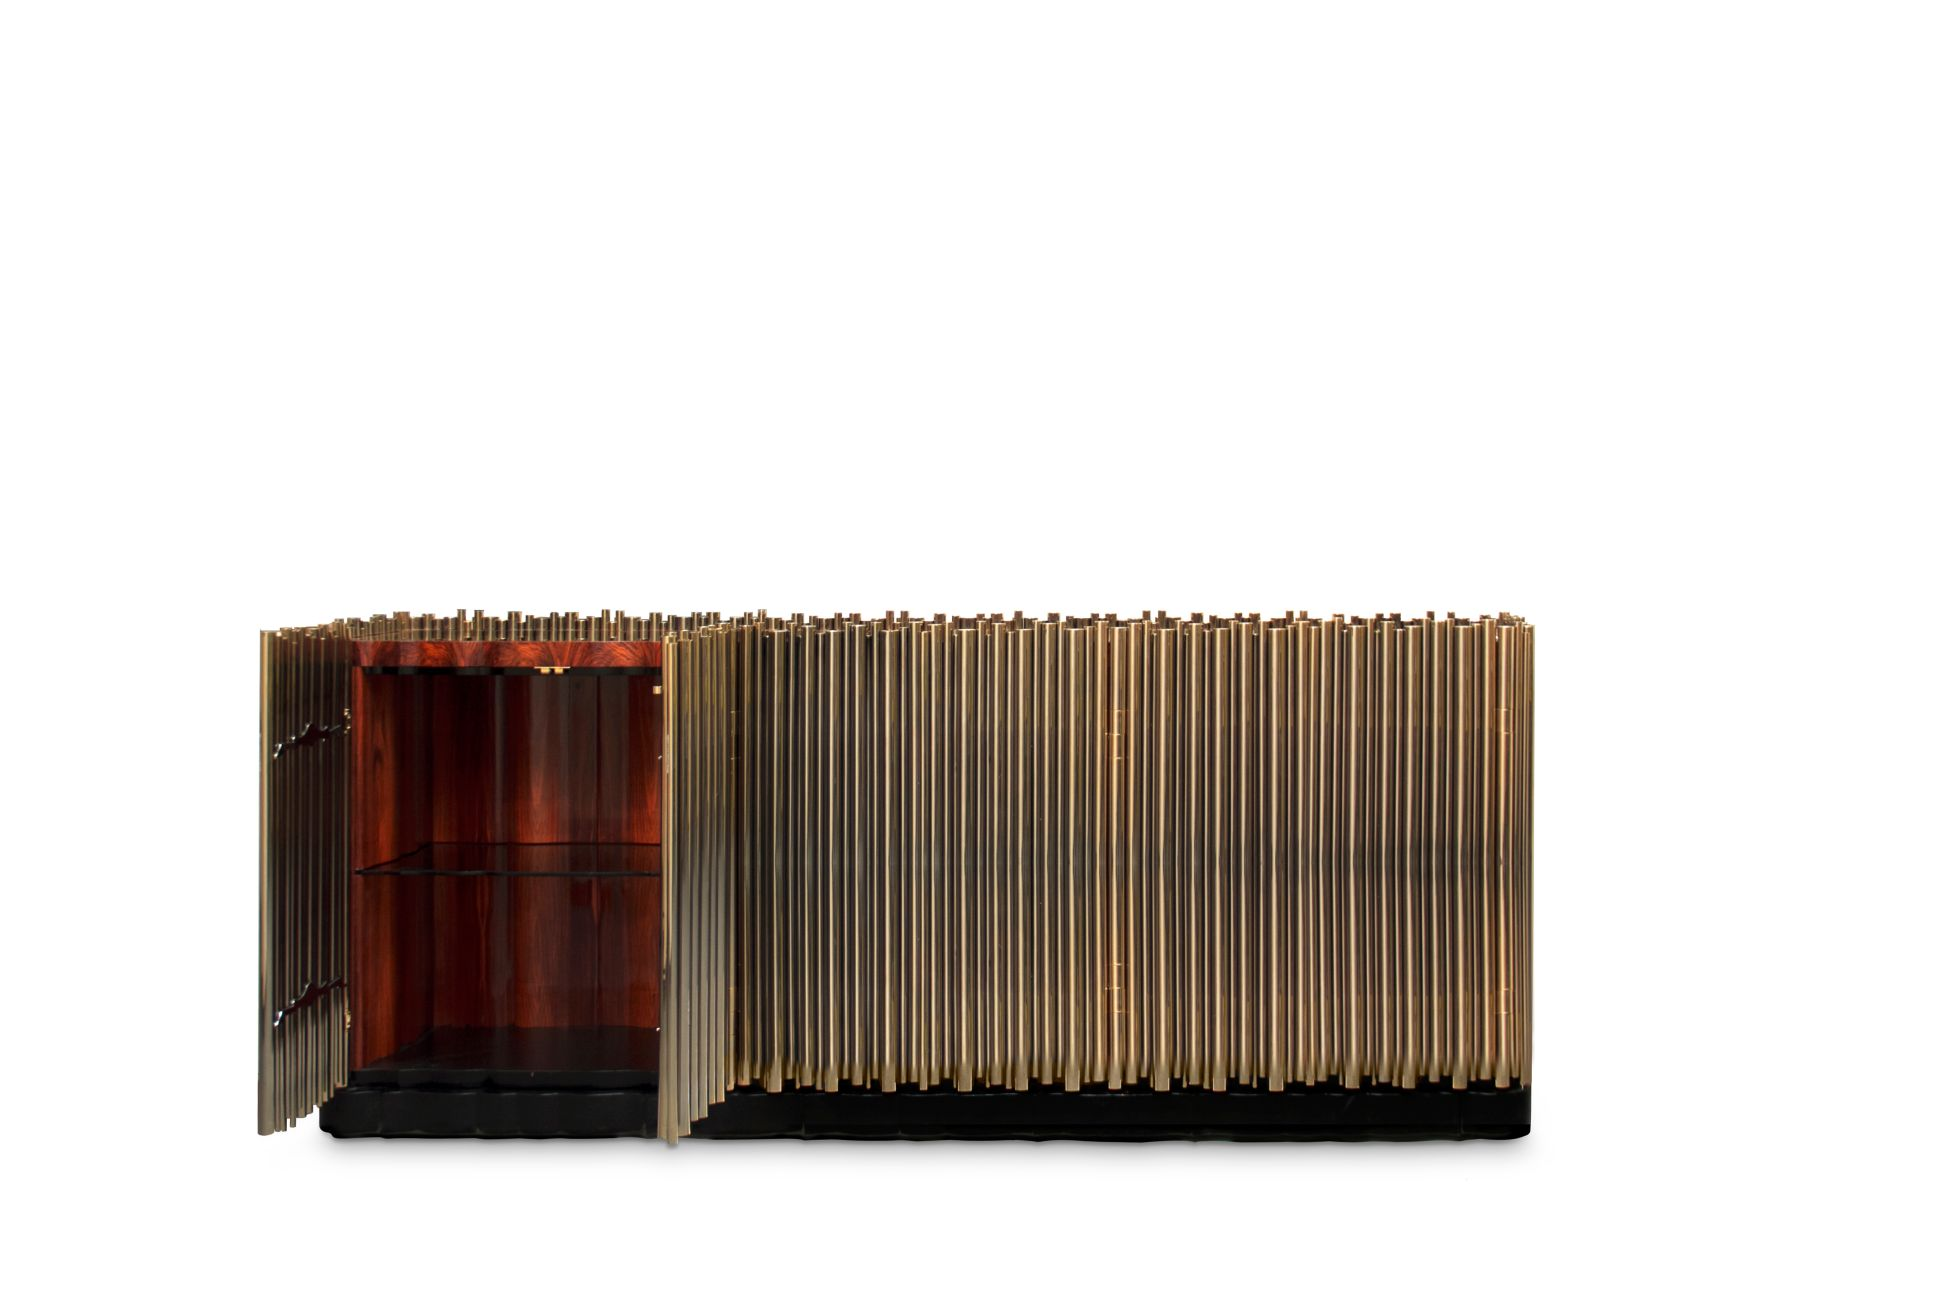 A Premium Selection Of 20 Modern Sideboards You Need To See modern sideboard A Premium Selection Of 15 Modern Sideboards You Need To See symphony sideboard boca do lobo 03